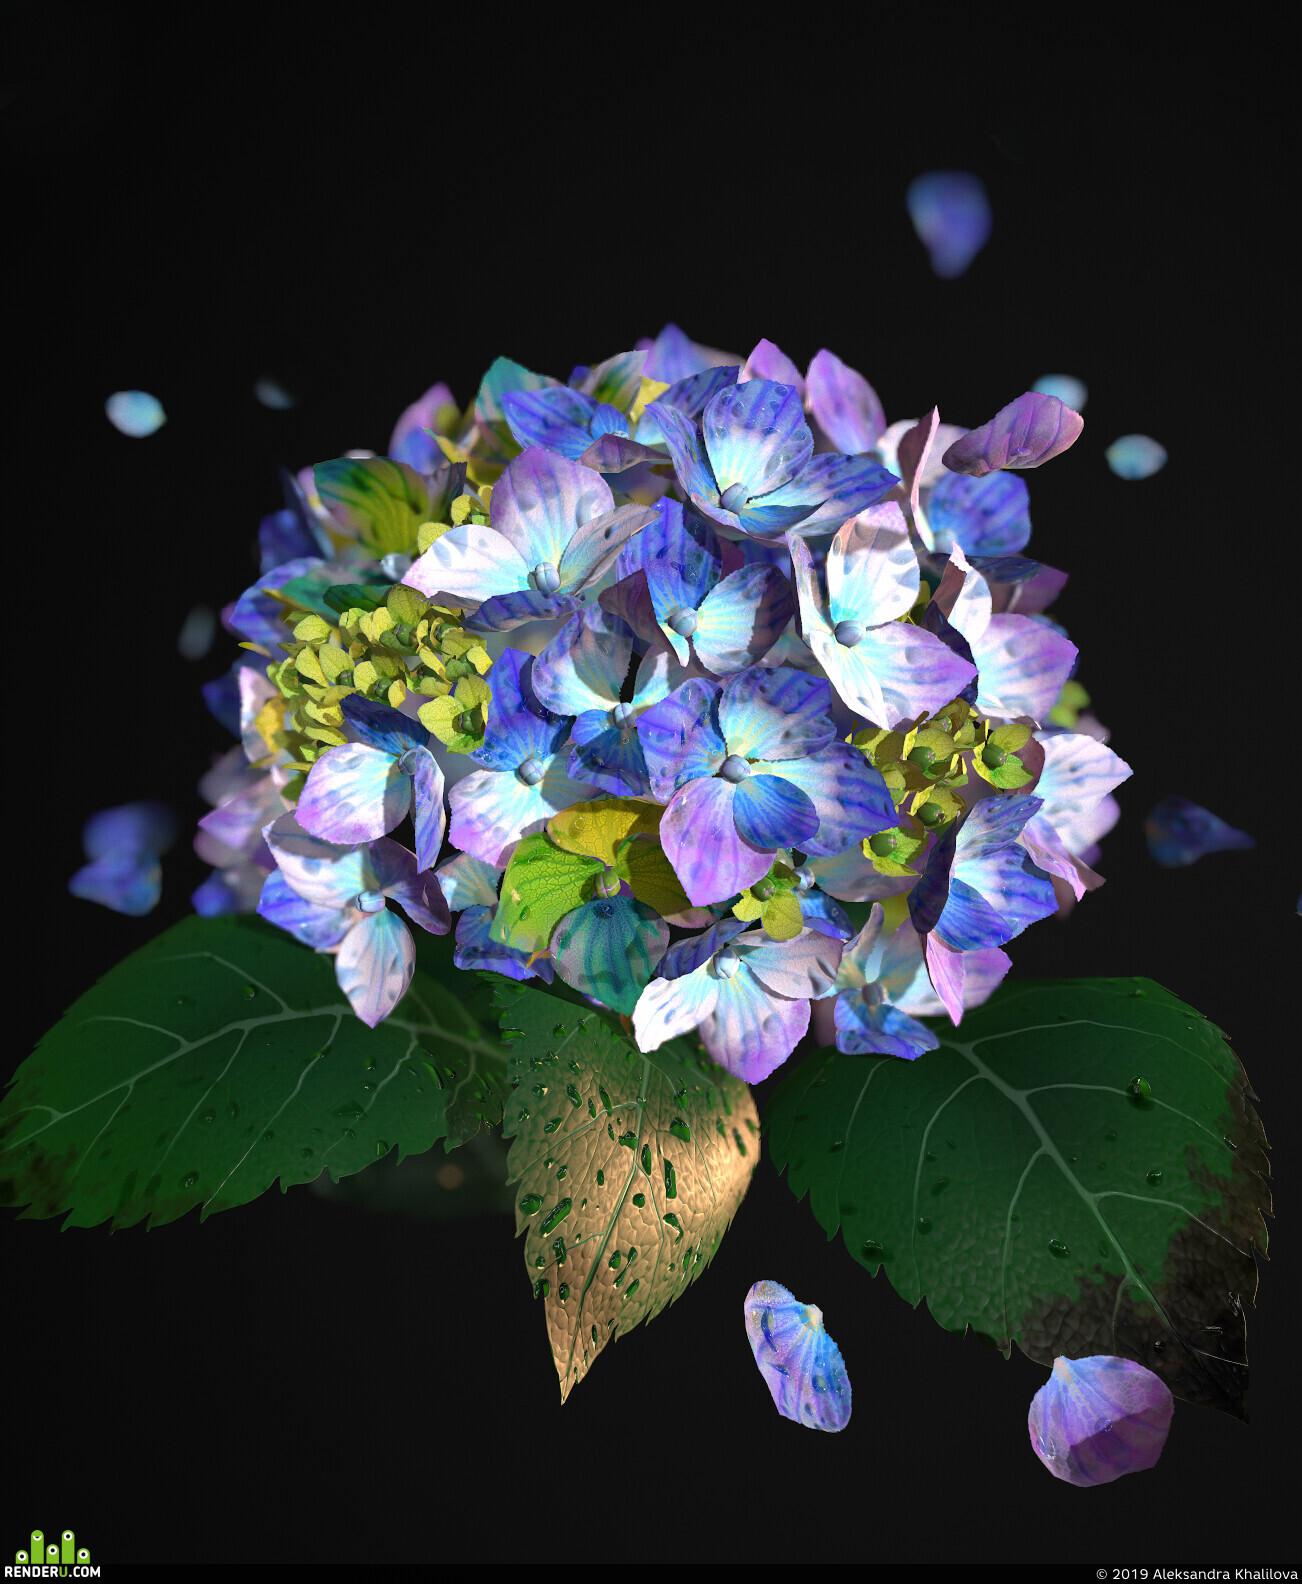 flowers, environment